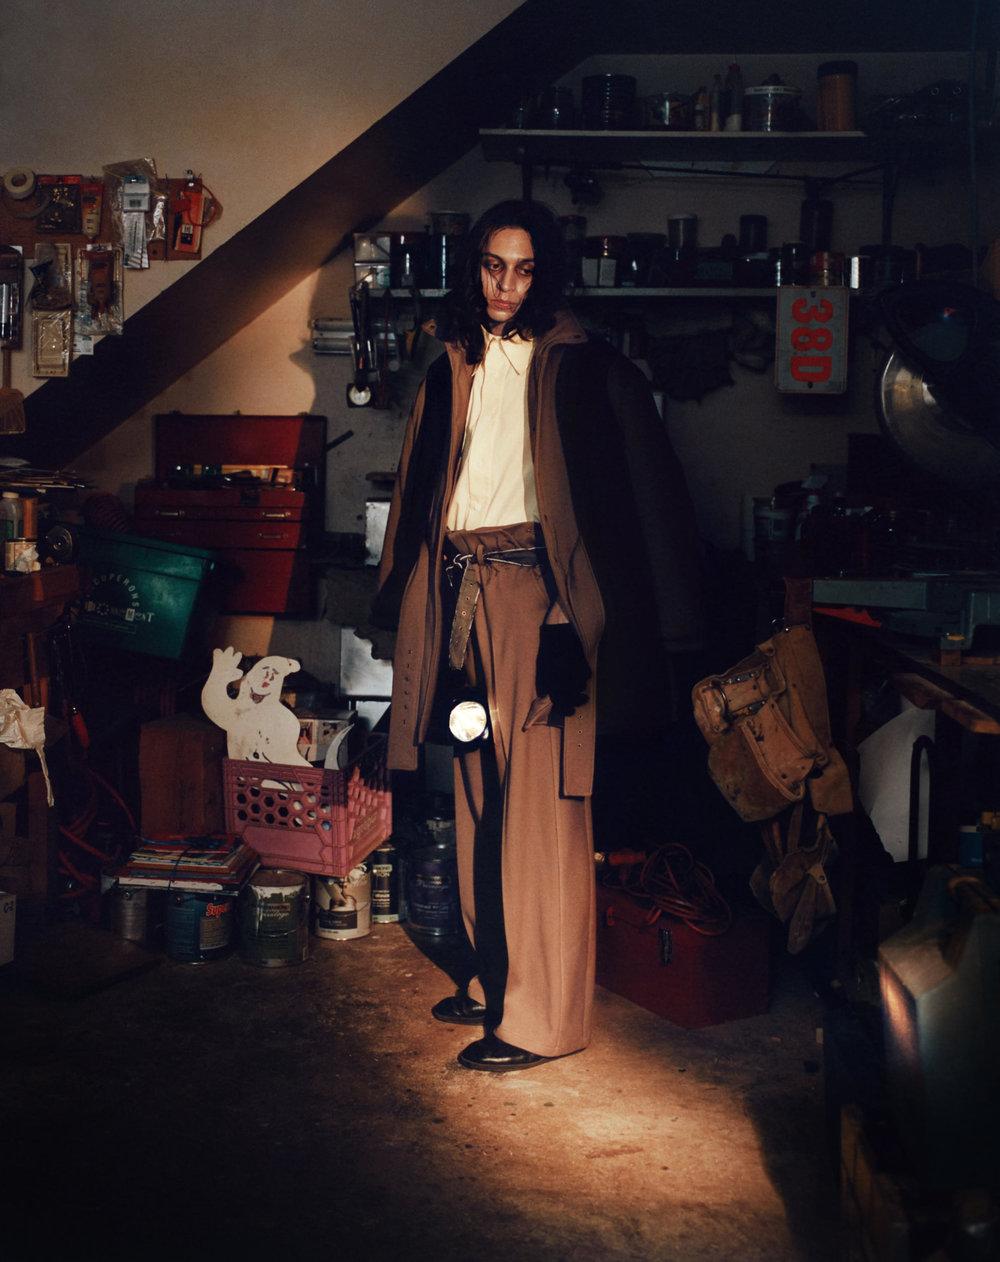 Photographic expressionism with Devon Corman on Anniversary Magazine